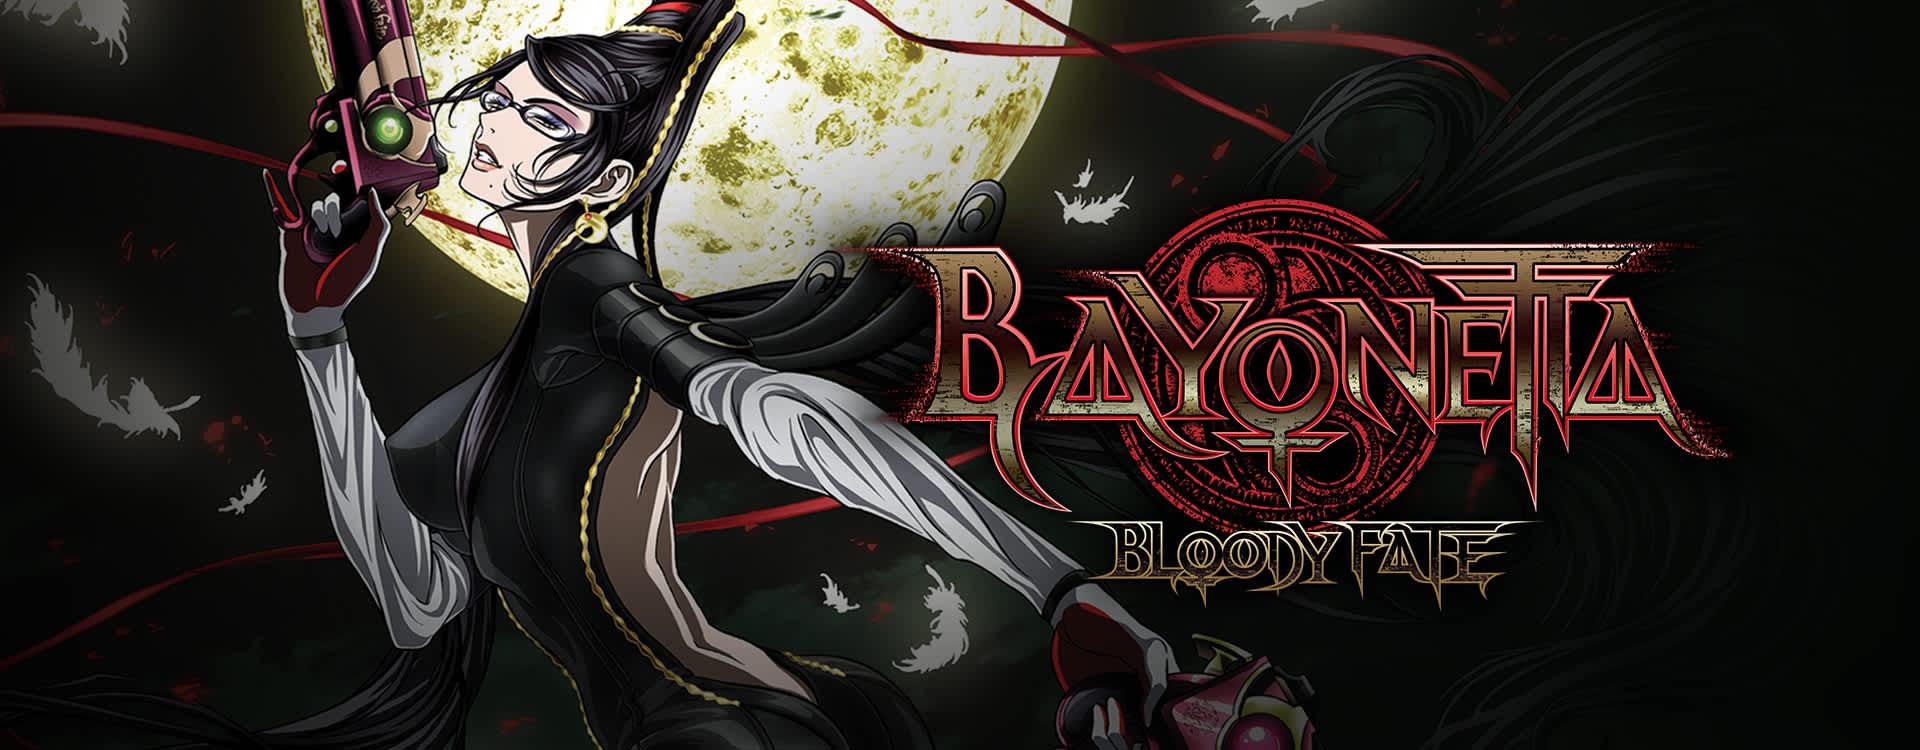 Watch Bayonetta Bloody Fate Movie Sub Dub Action Adventure